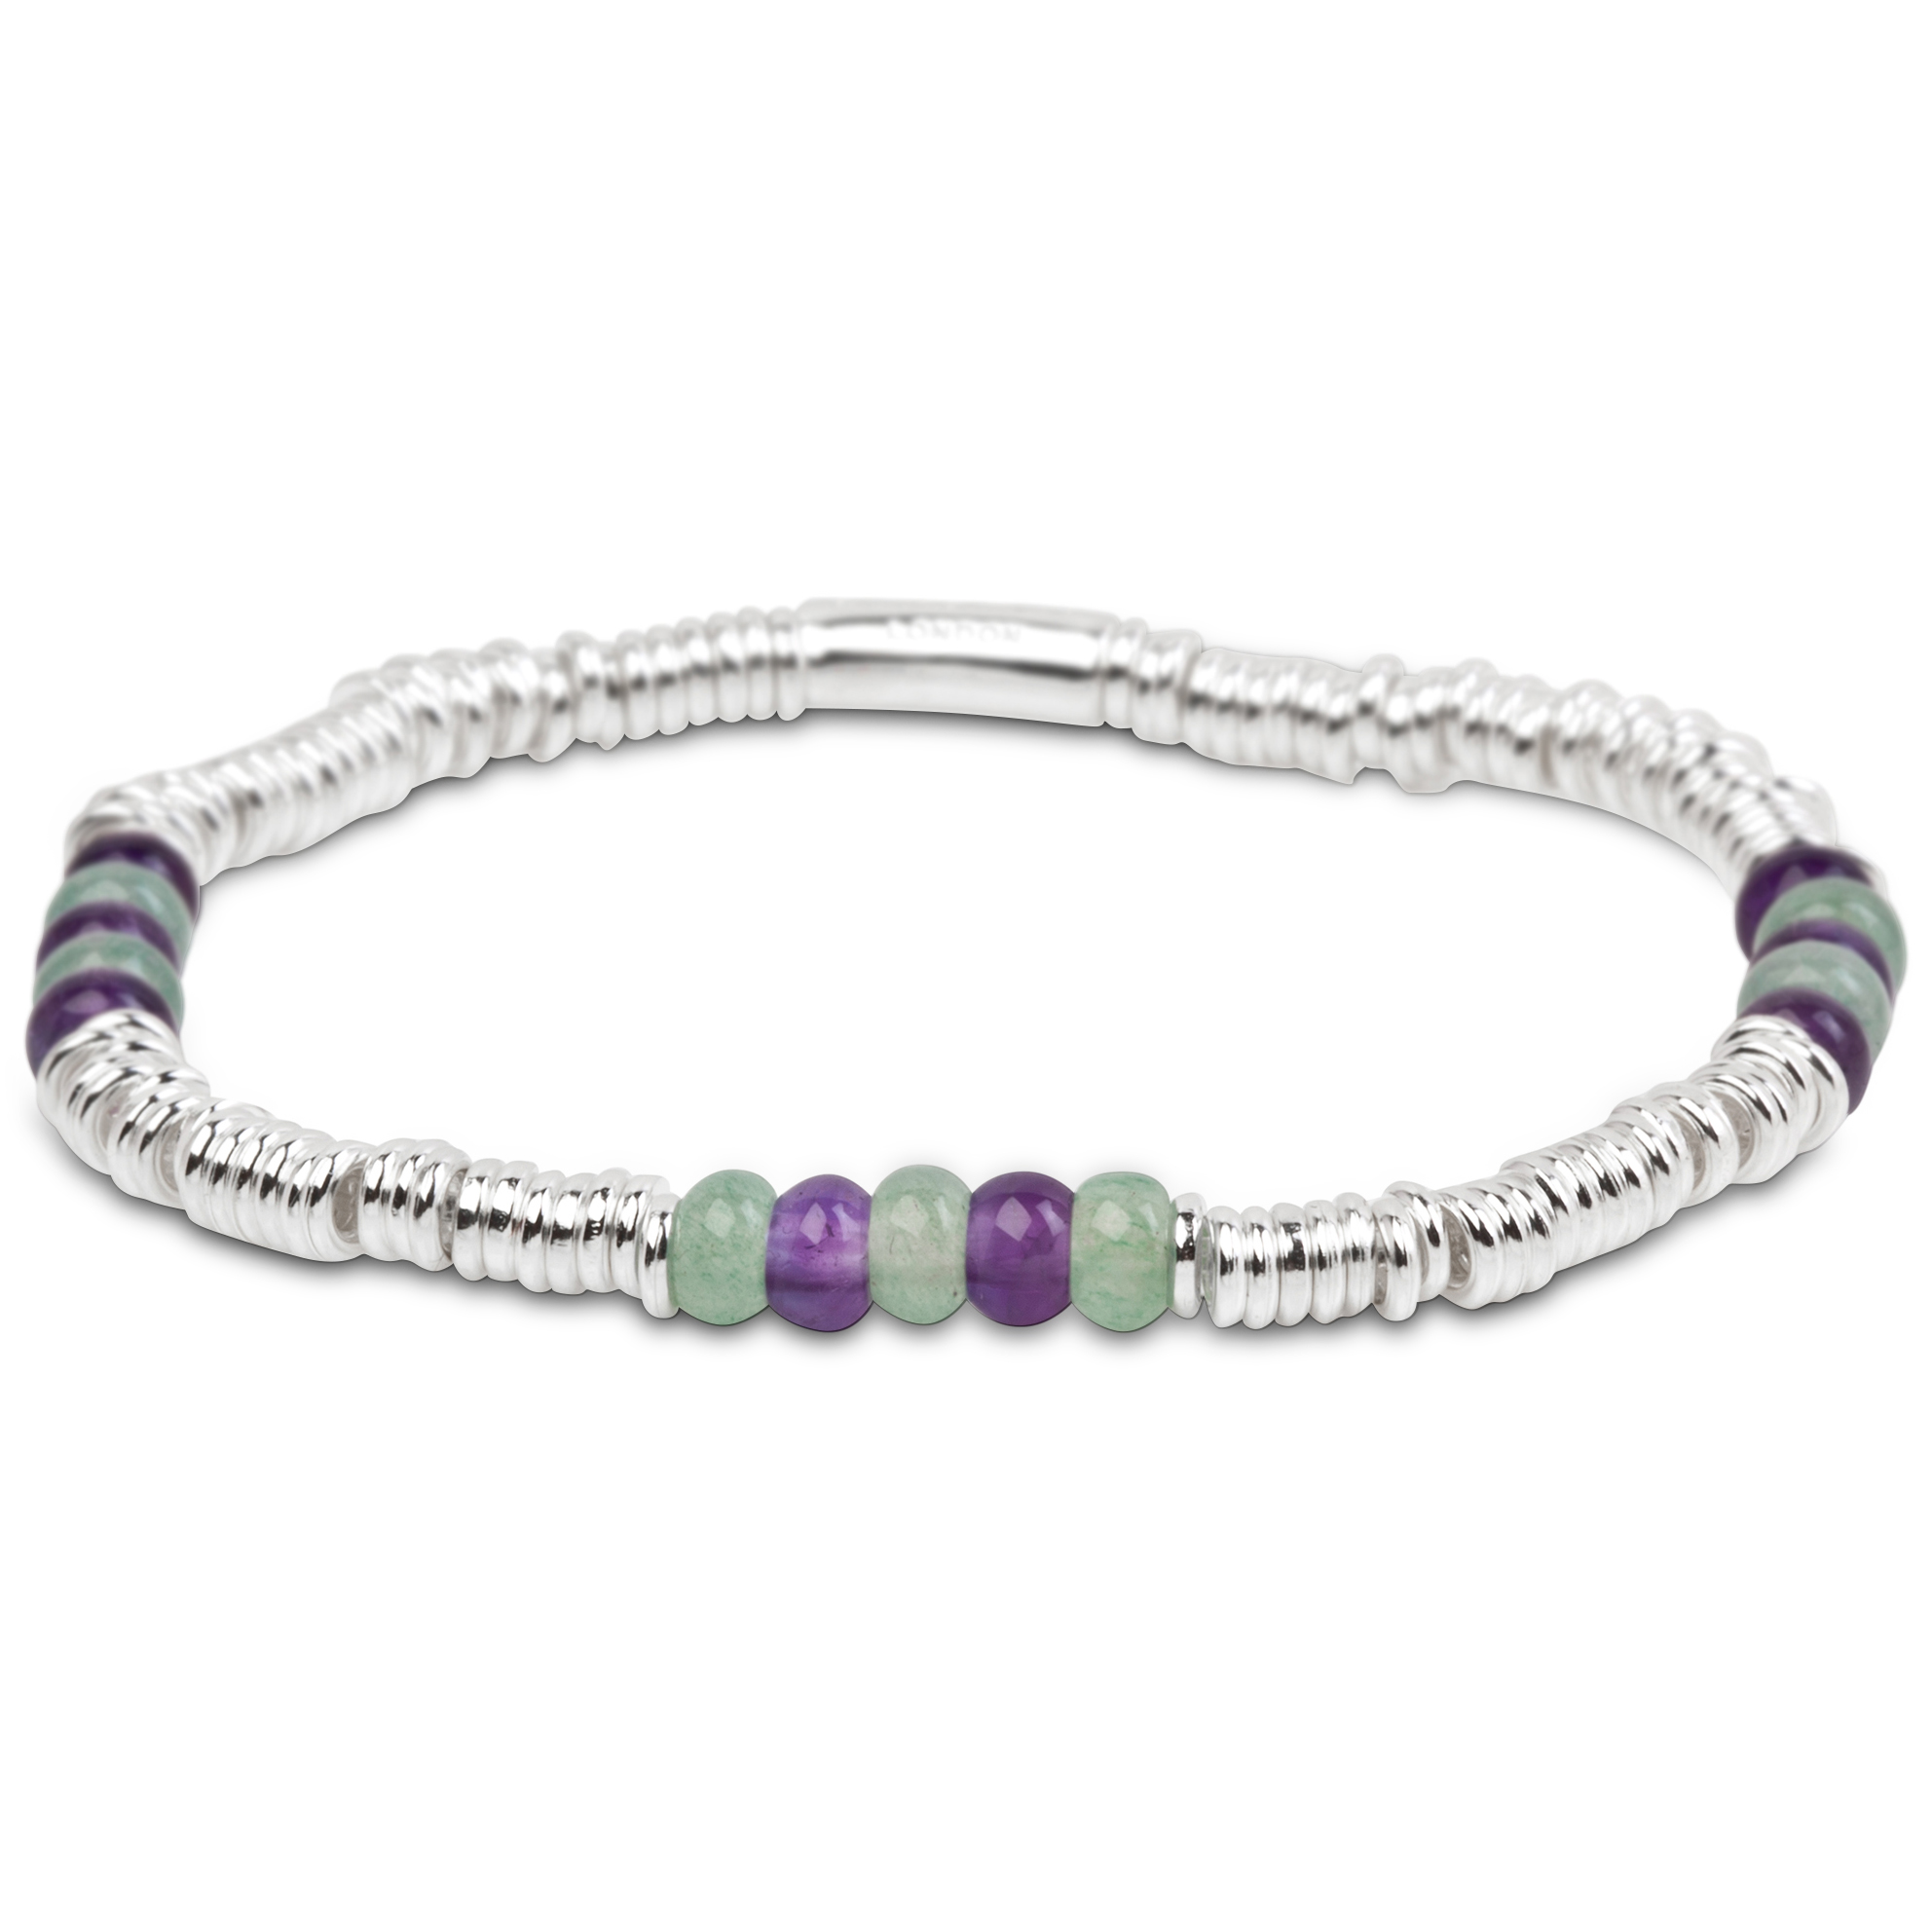 Wimbledon XS Sweetie Bracelet